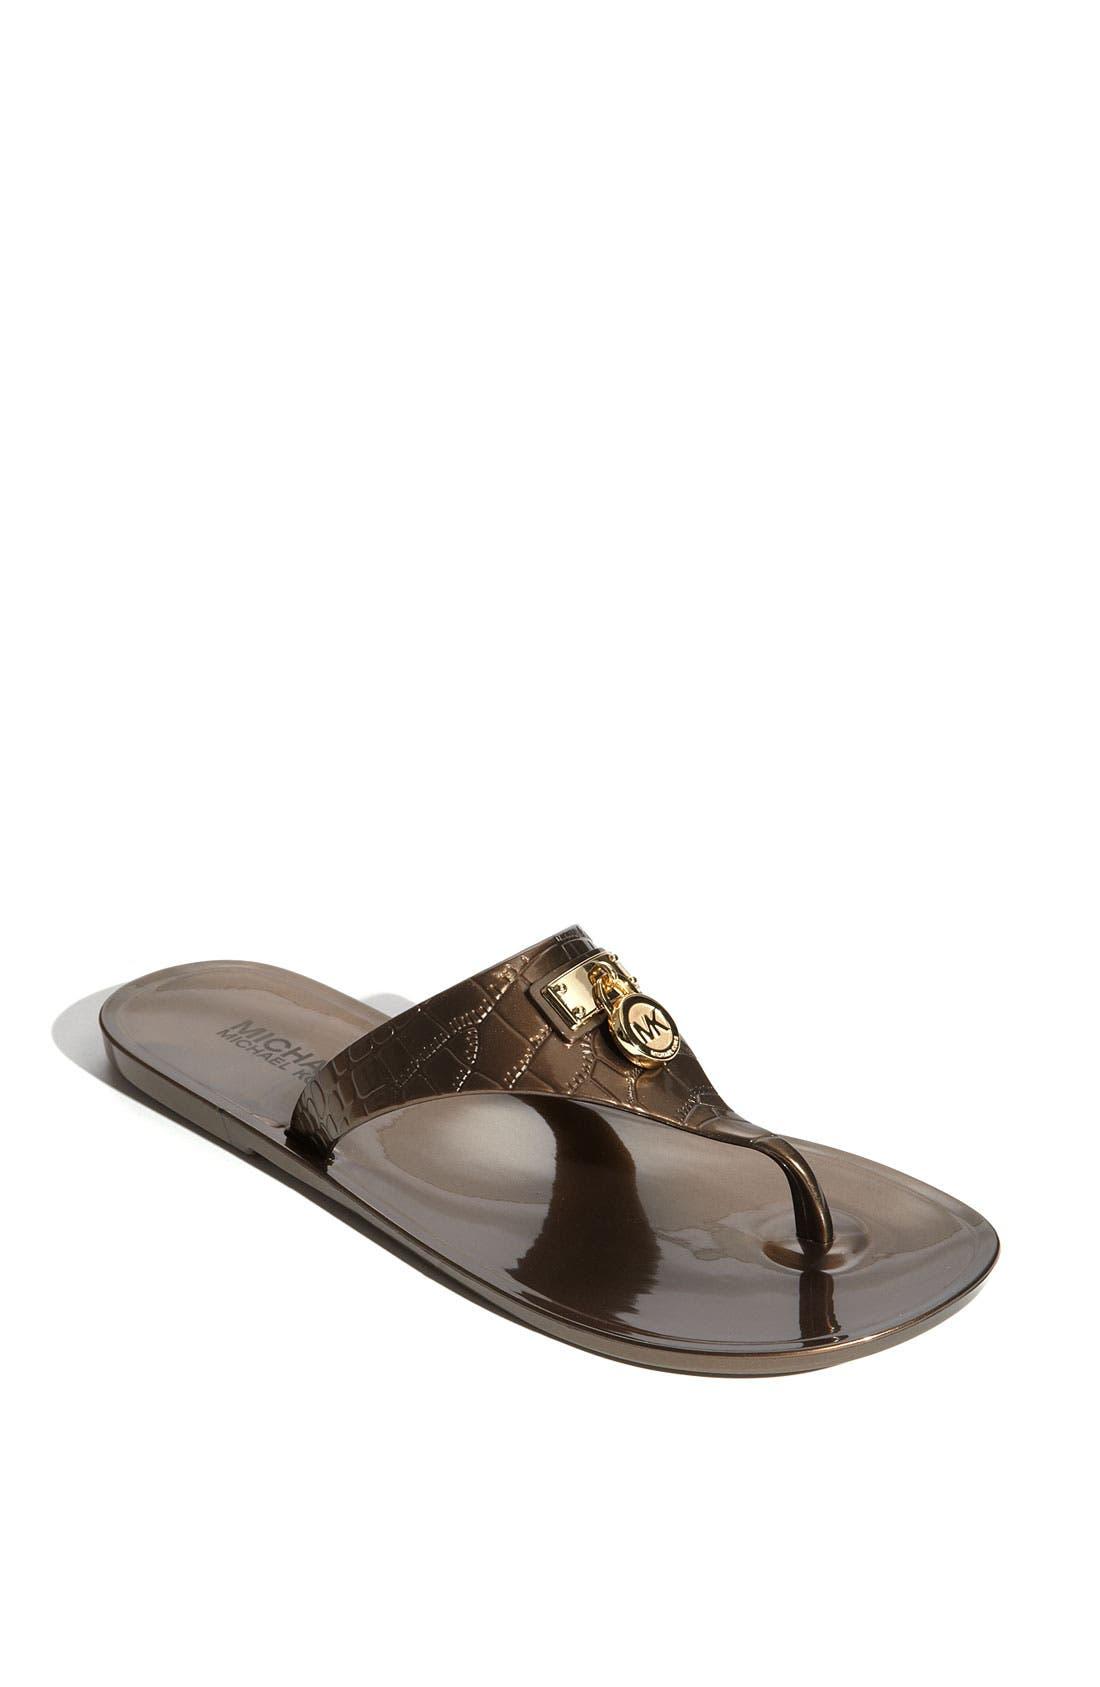 Alternate Image 1 Selected - MICHAEL Michael Kors 'Hamilton Croco Jelly' Sandal